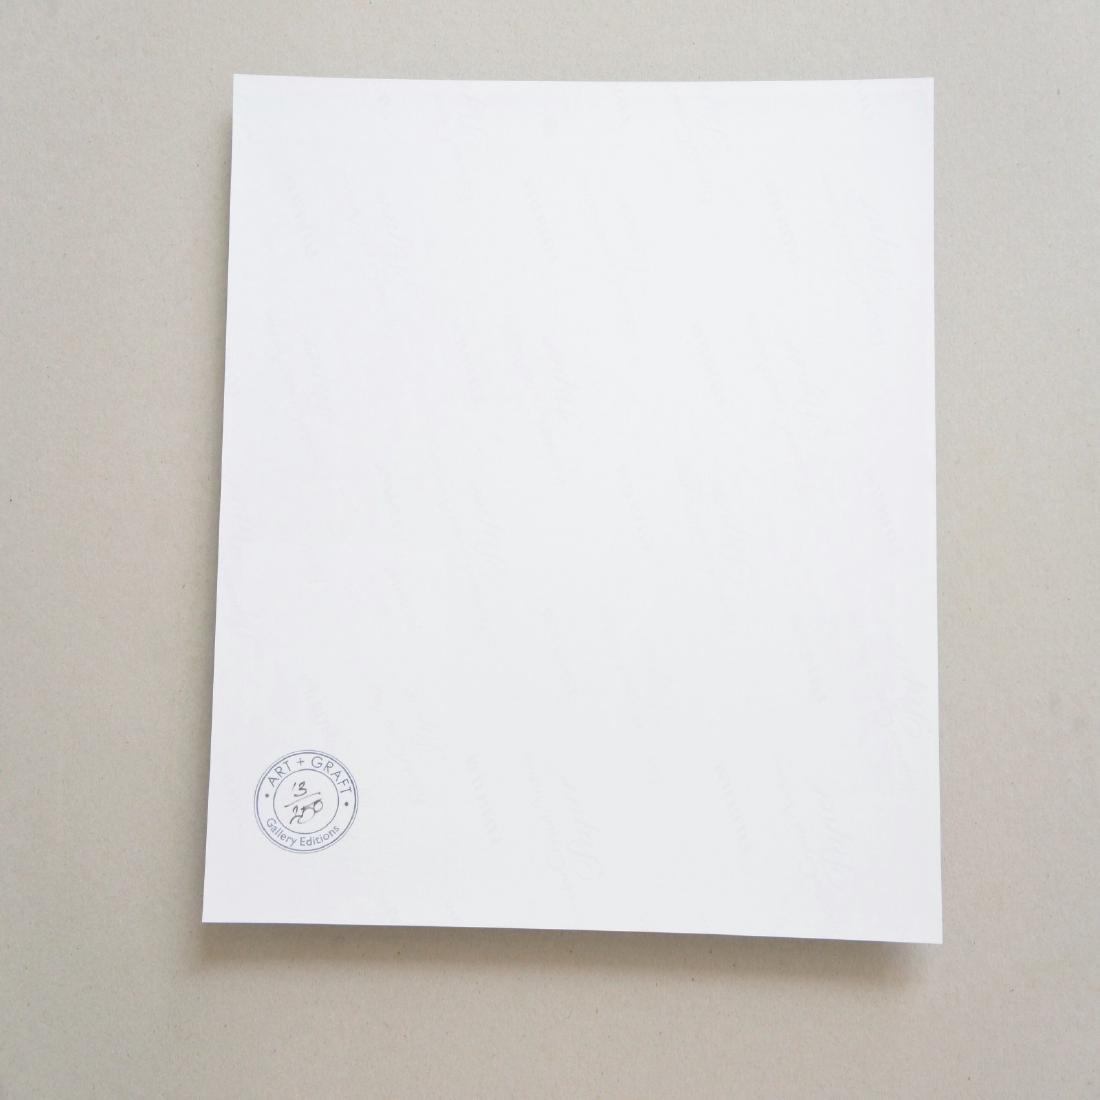 Dariusz Klimczak - Print - Relativity - 3